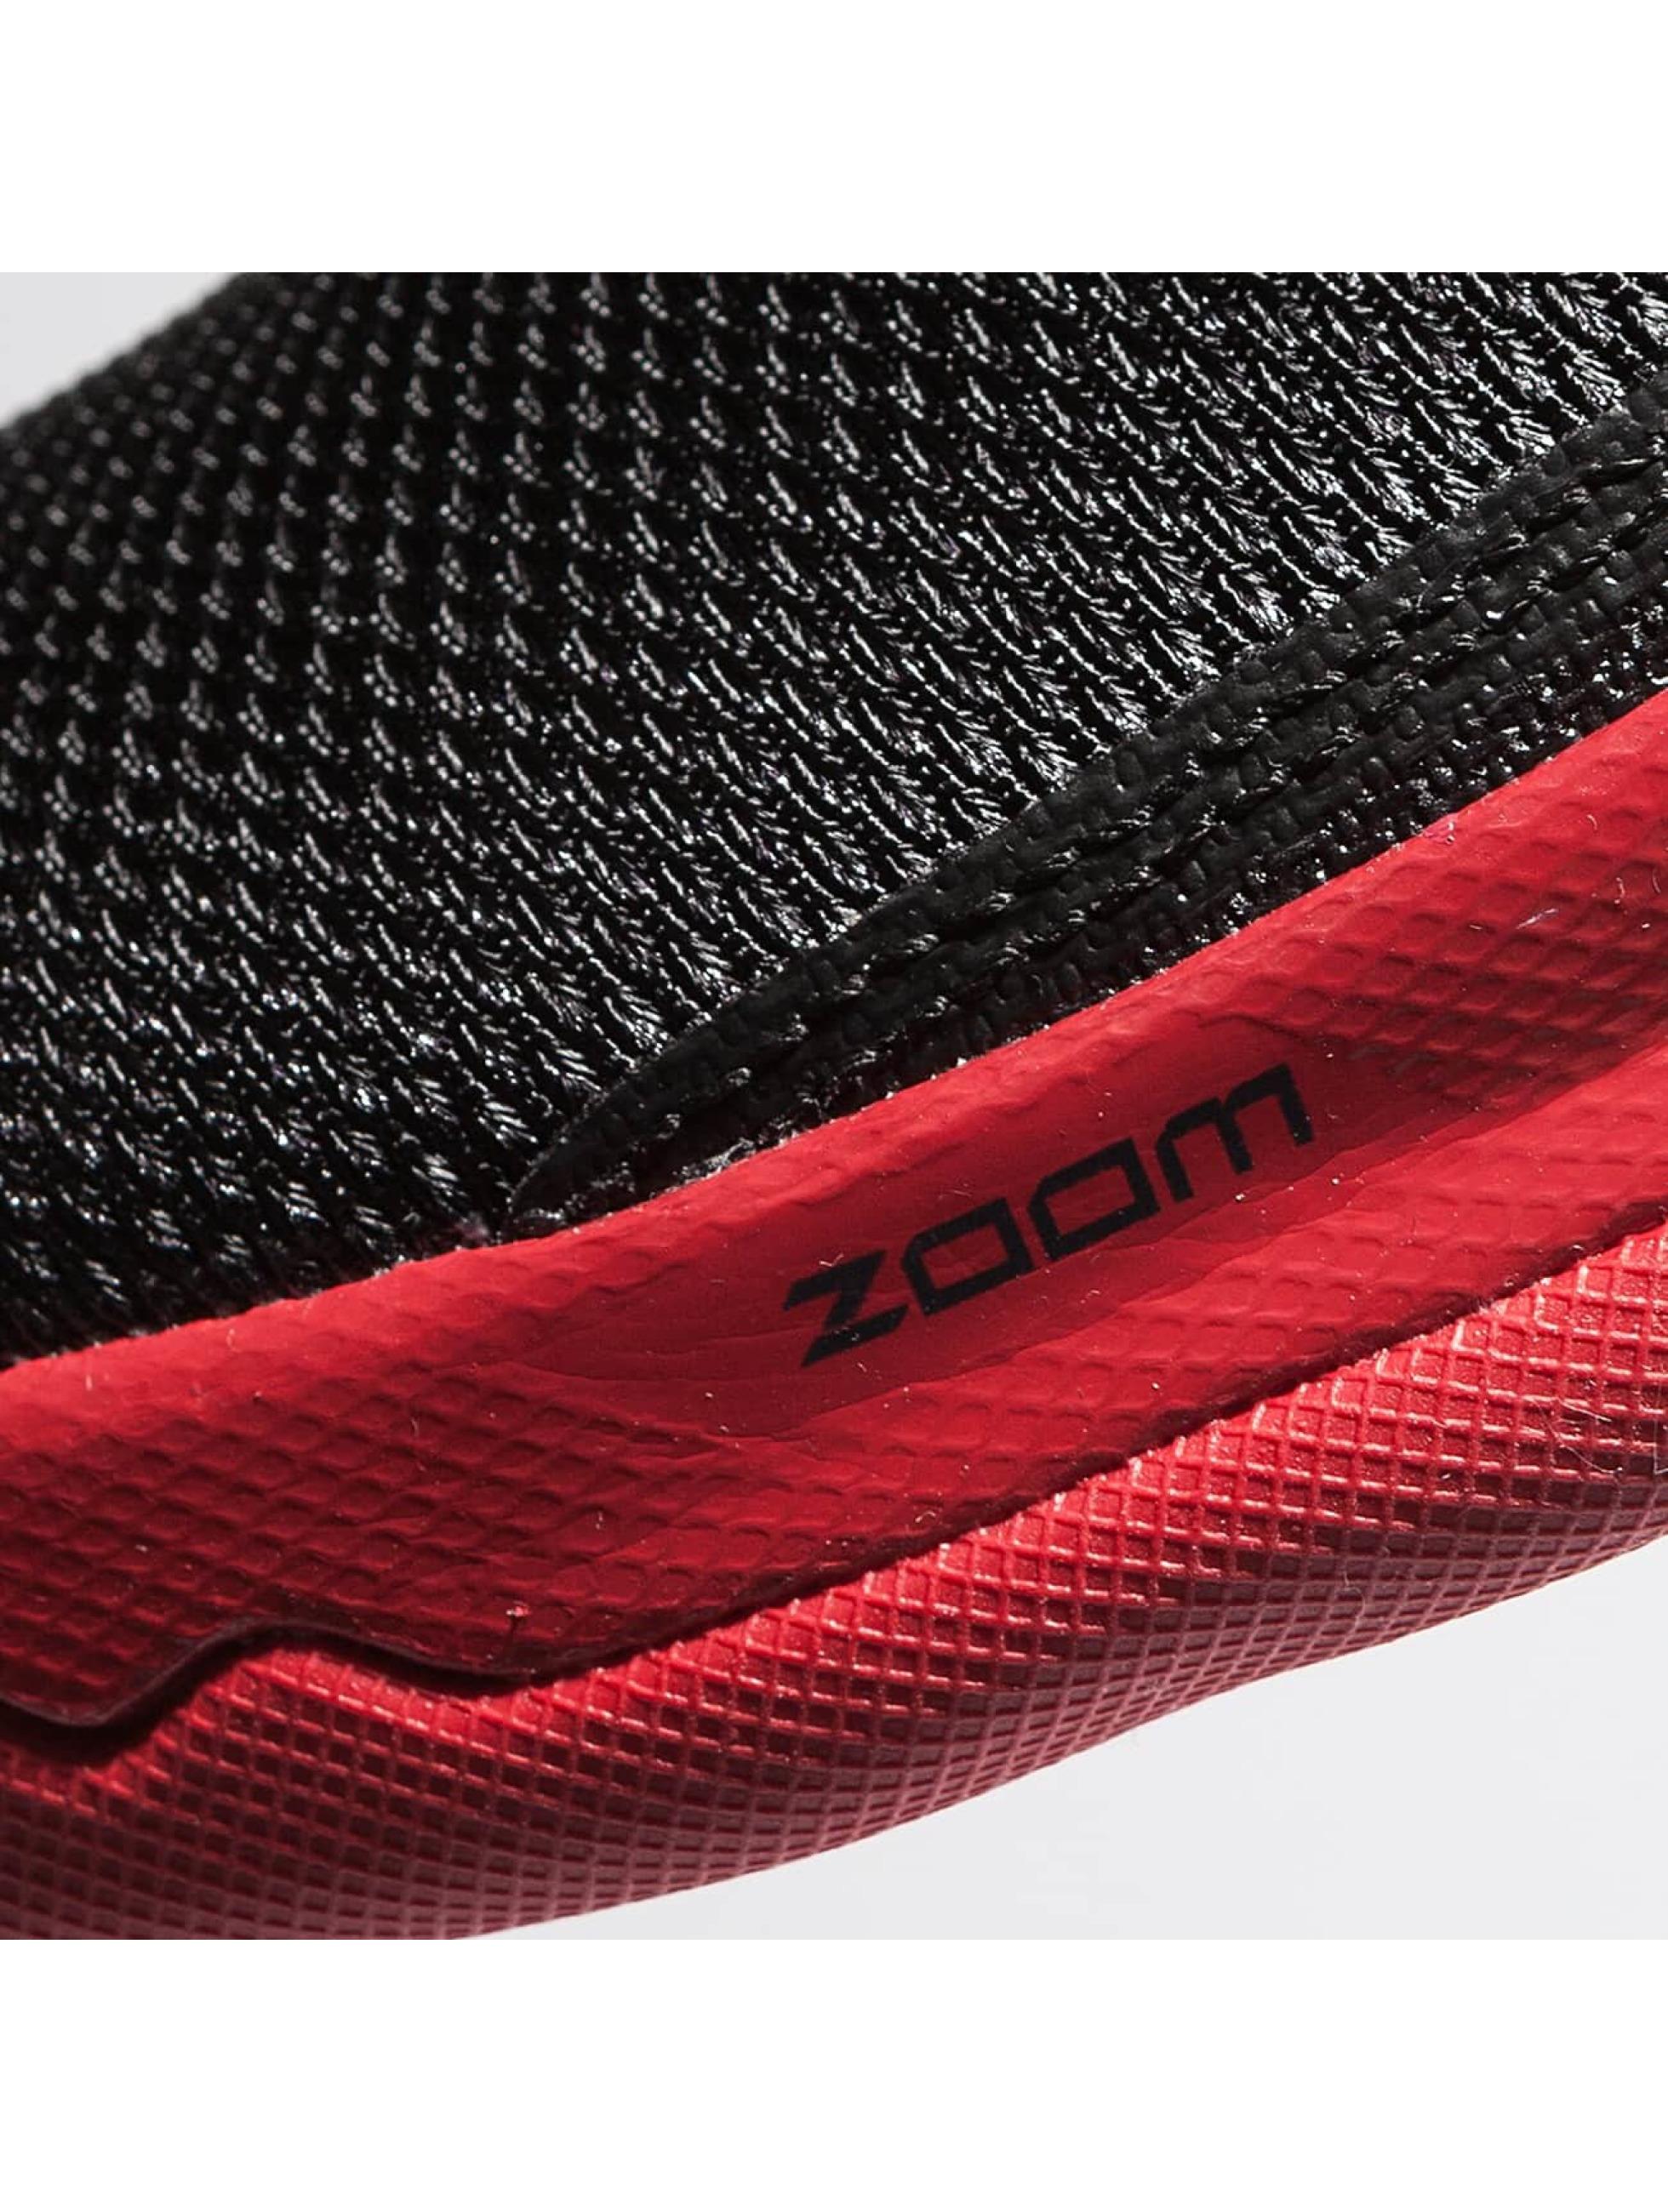 Jordan Sneakers Super Fly 5 black